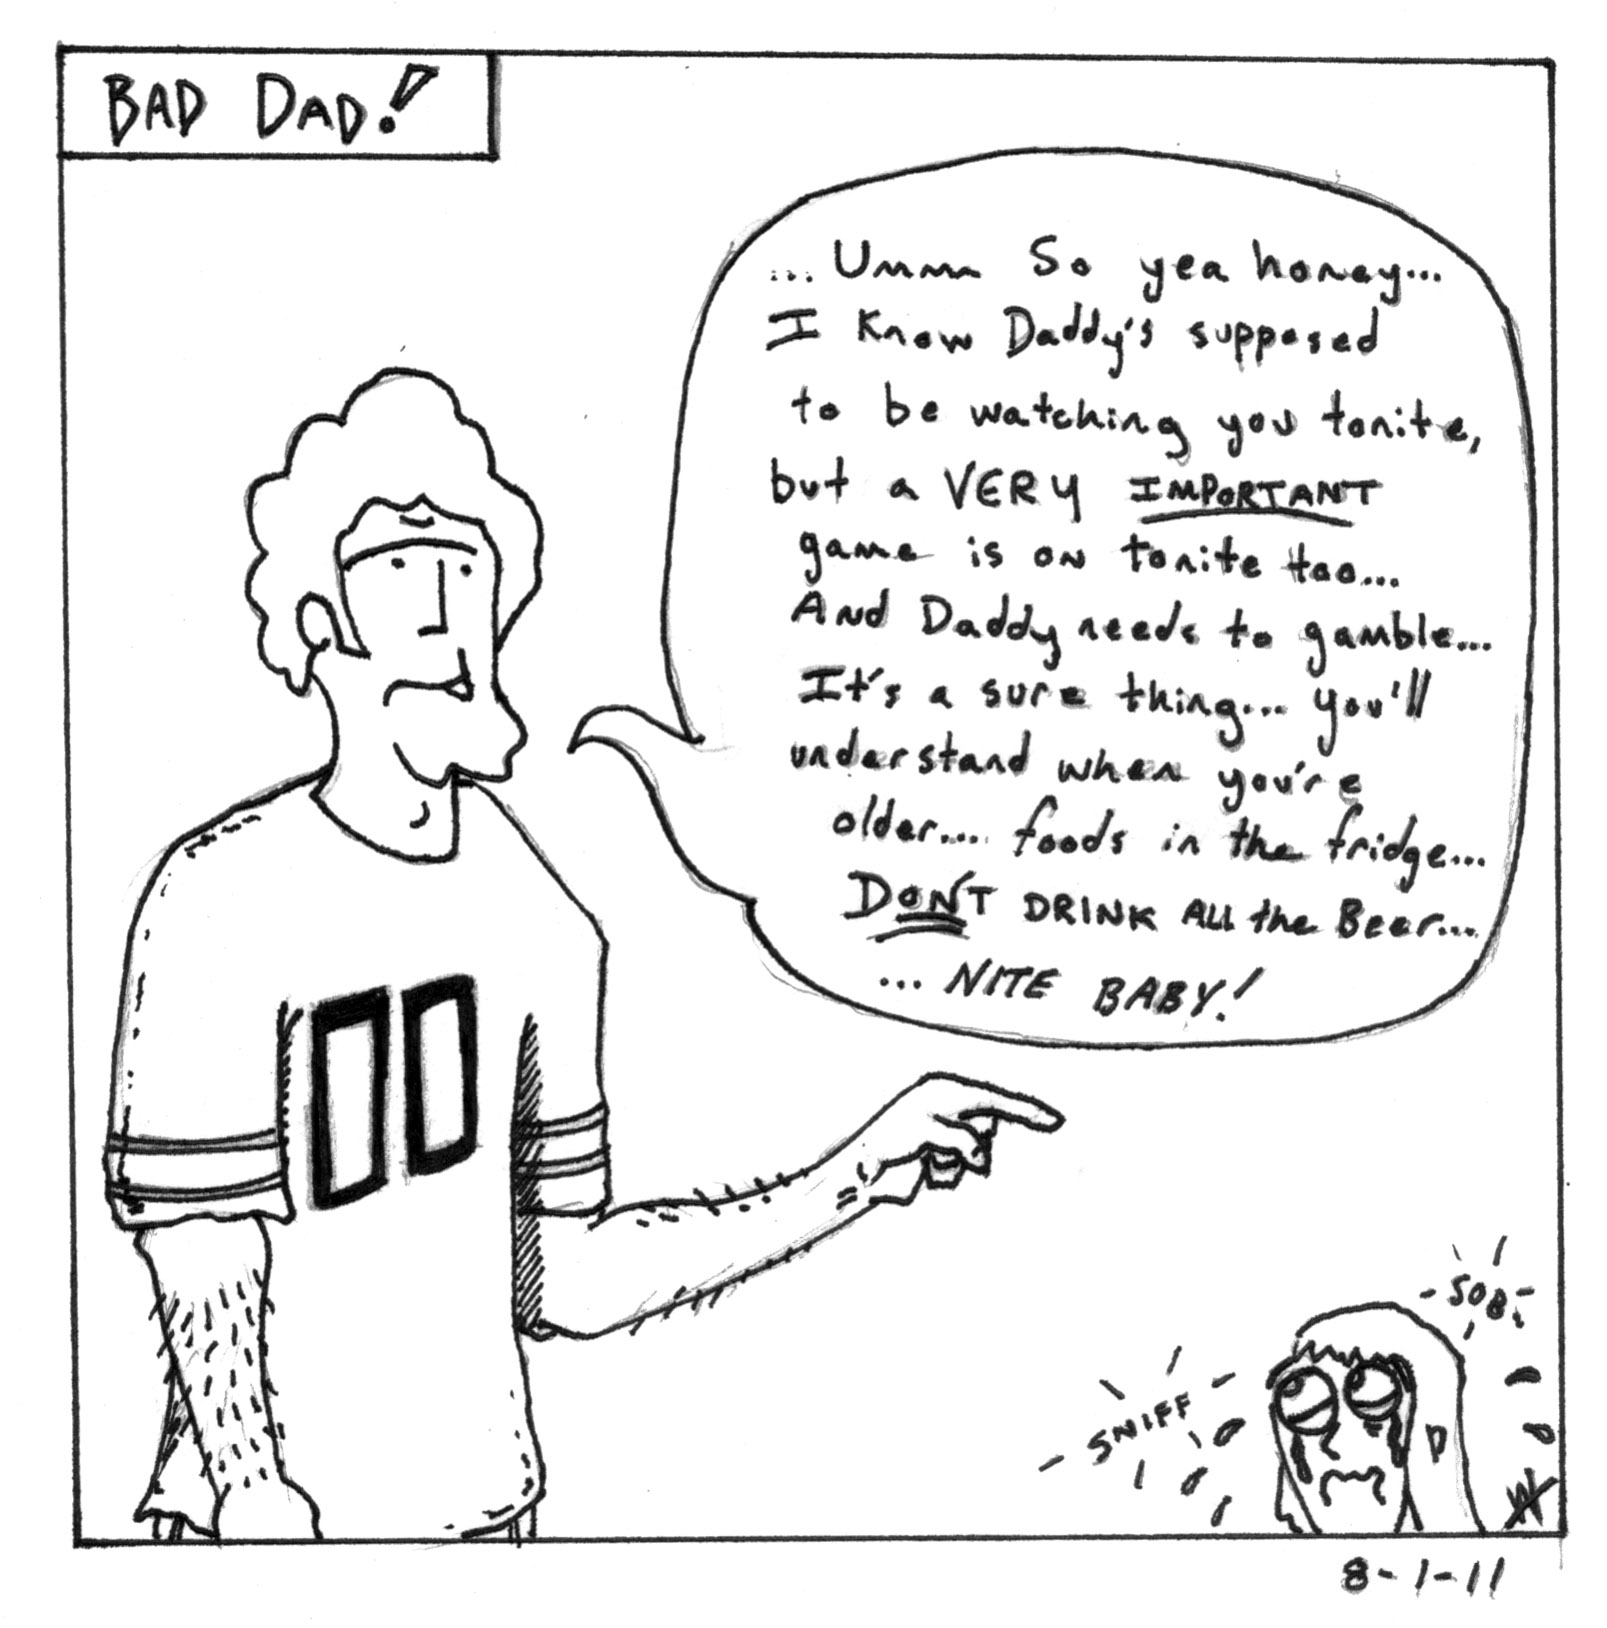 Bad Dad - Gamble